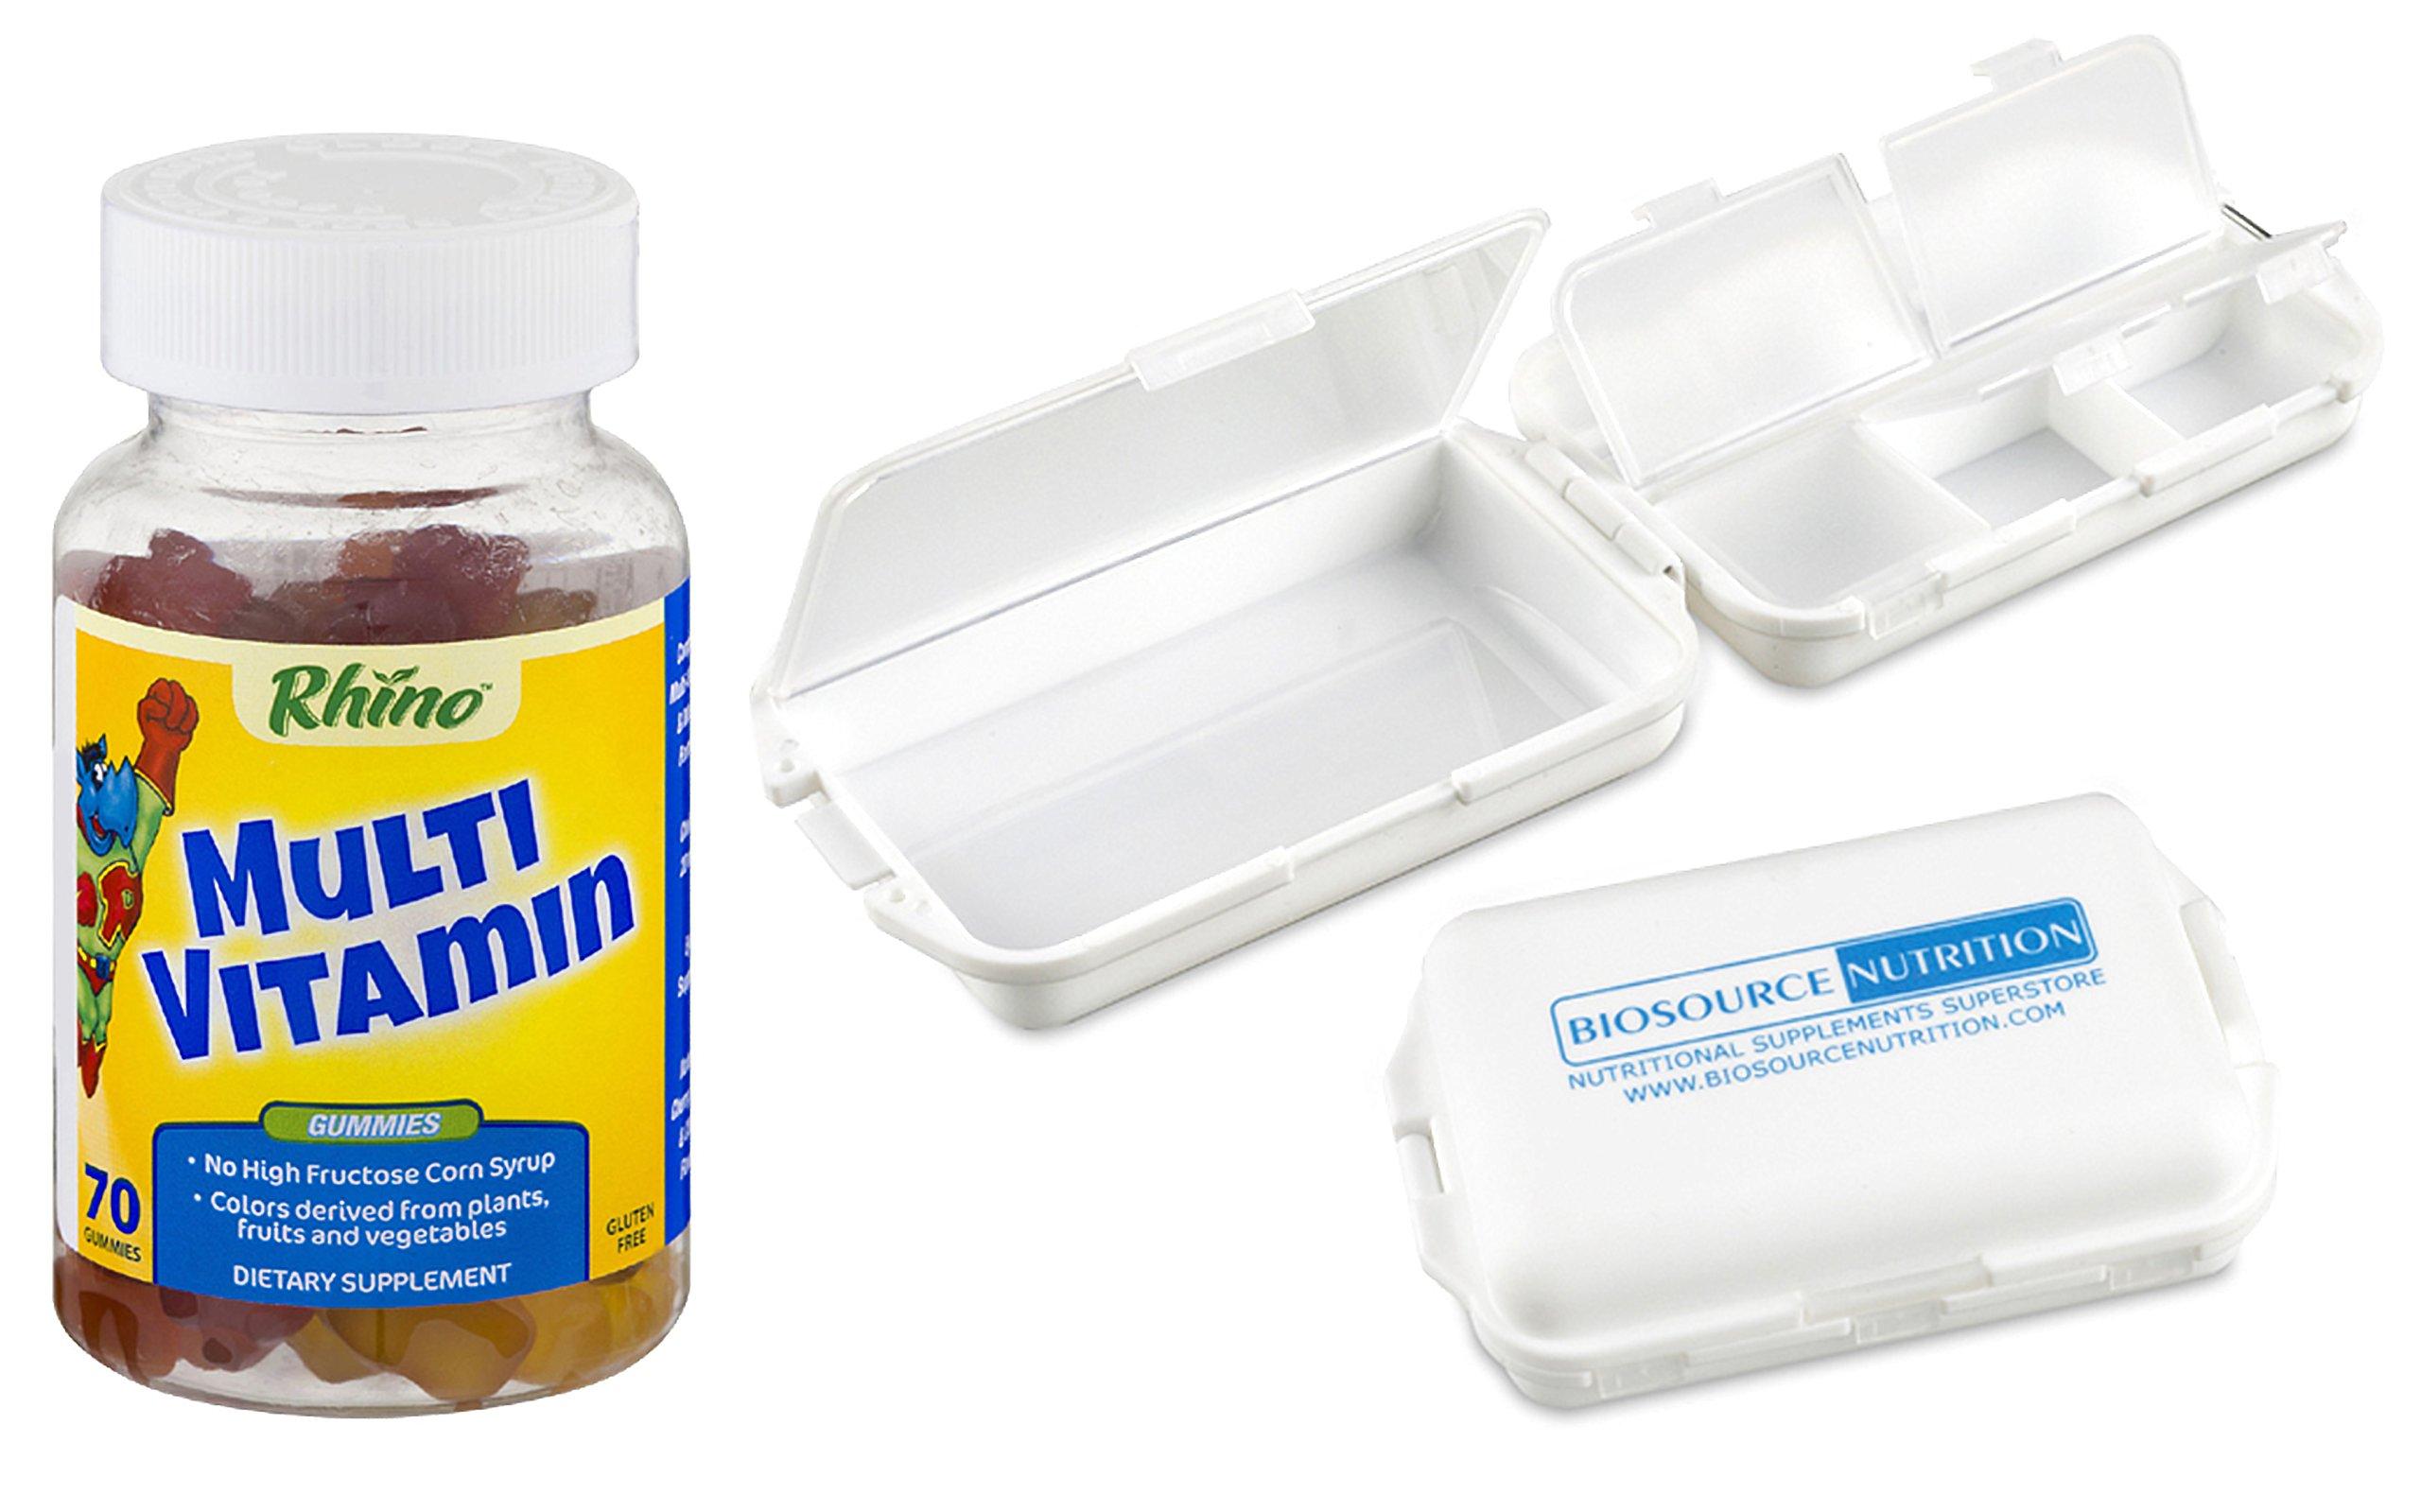 Rhino Multivitamin 70 Gummy Bears in Bundle with Biosource Nutrition Pocket Pill Box